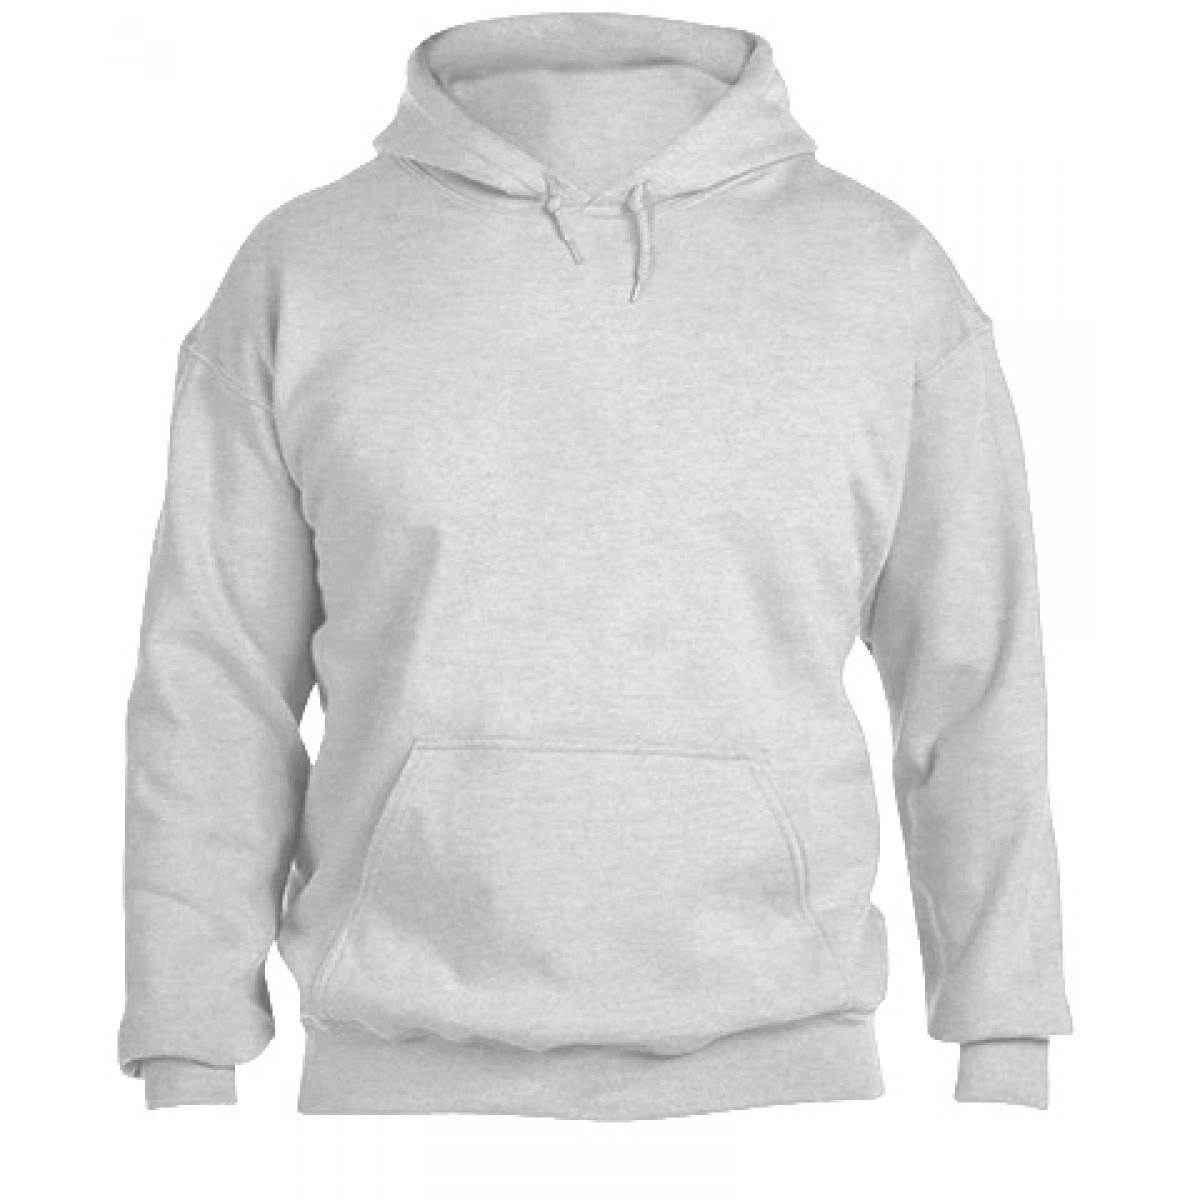 Solid Hooded Sweatshirt  50/50 Heavy Blend-Ash Gray-2XL